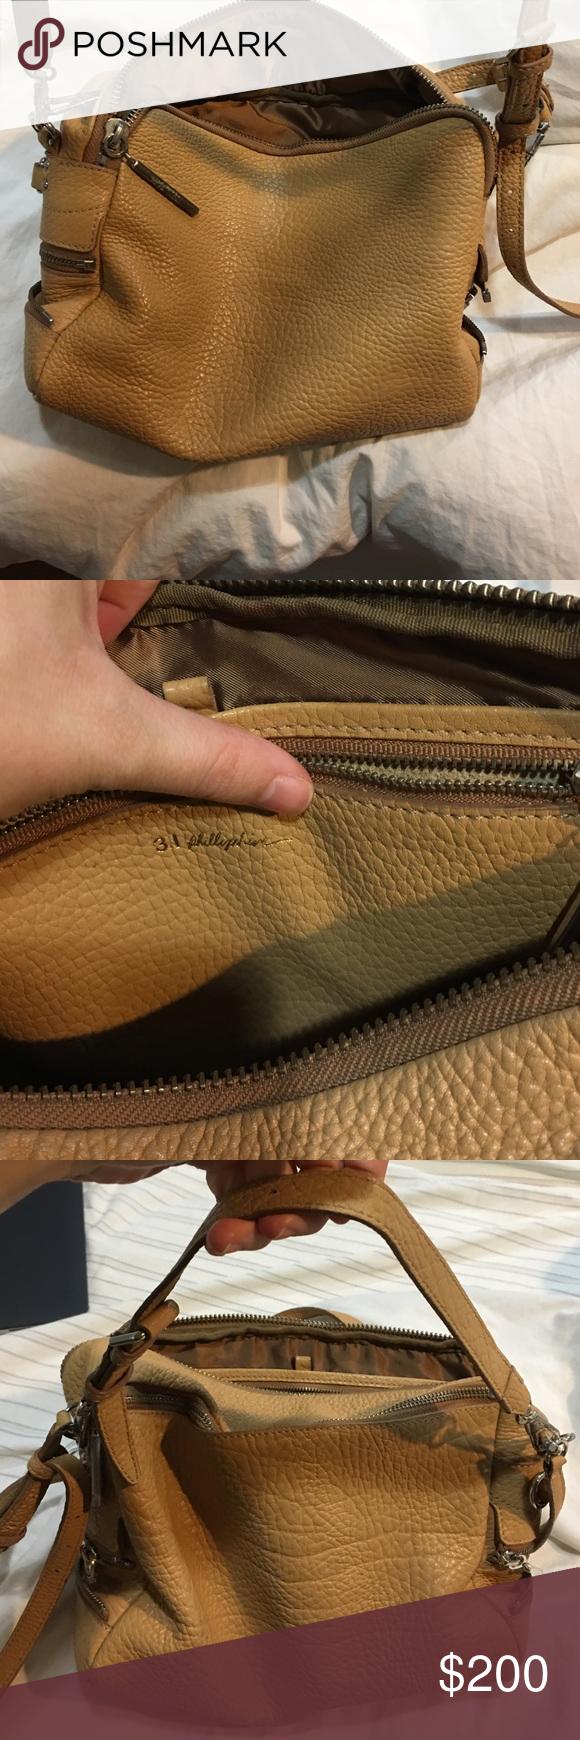 3.1 Phillip Lim handbag Tan, 3.1 Phillip lim handbag. Some signs of wear on metal and inside. 3.1 Phillip Lim Bags Crossbody Bags